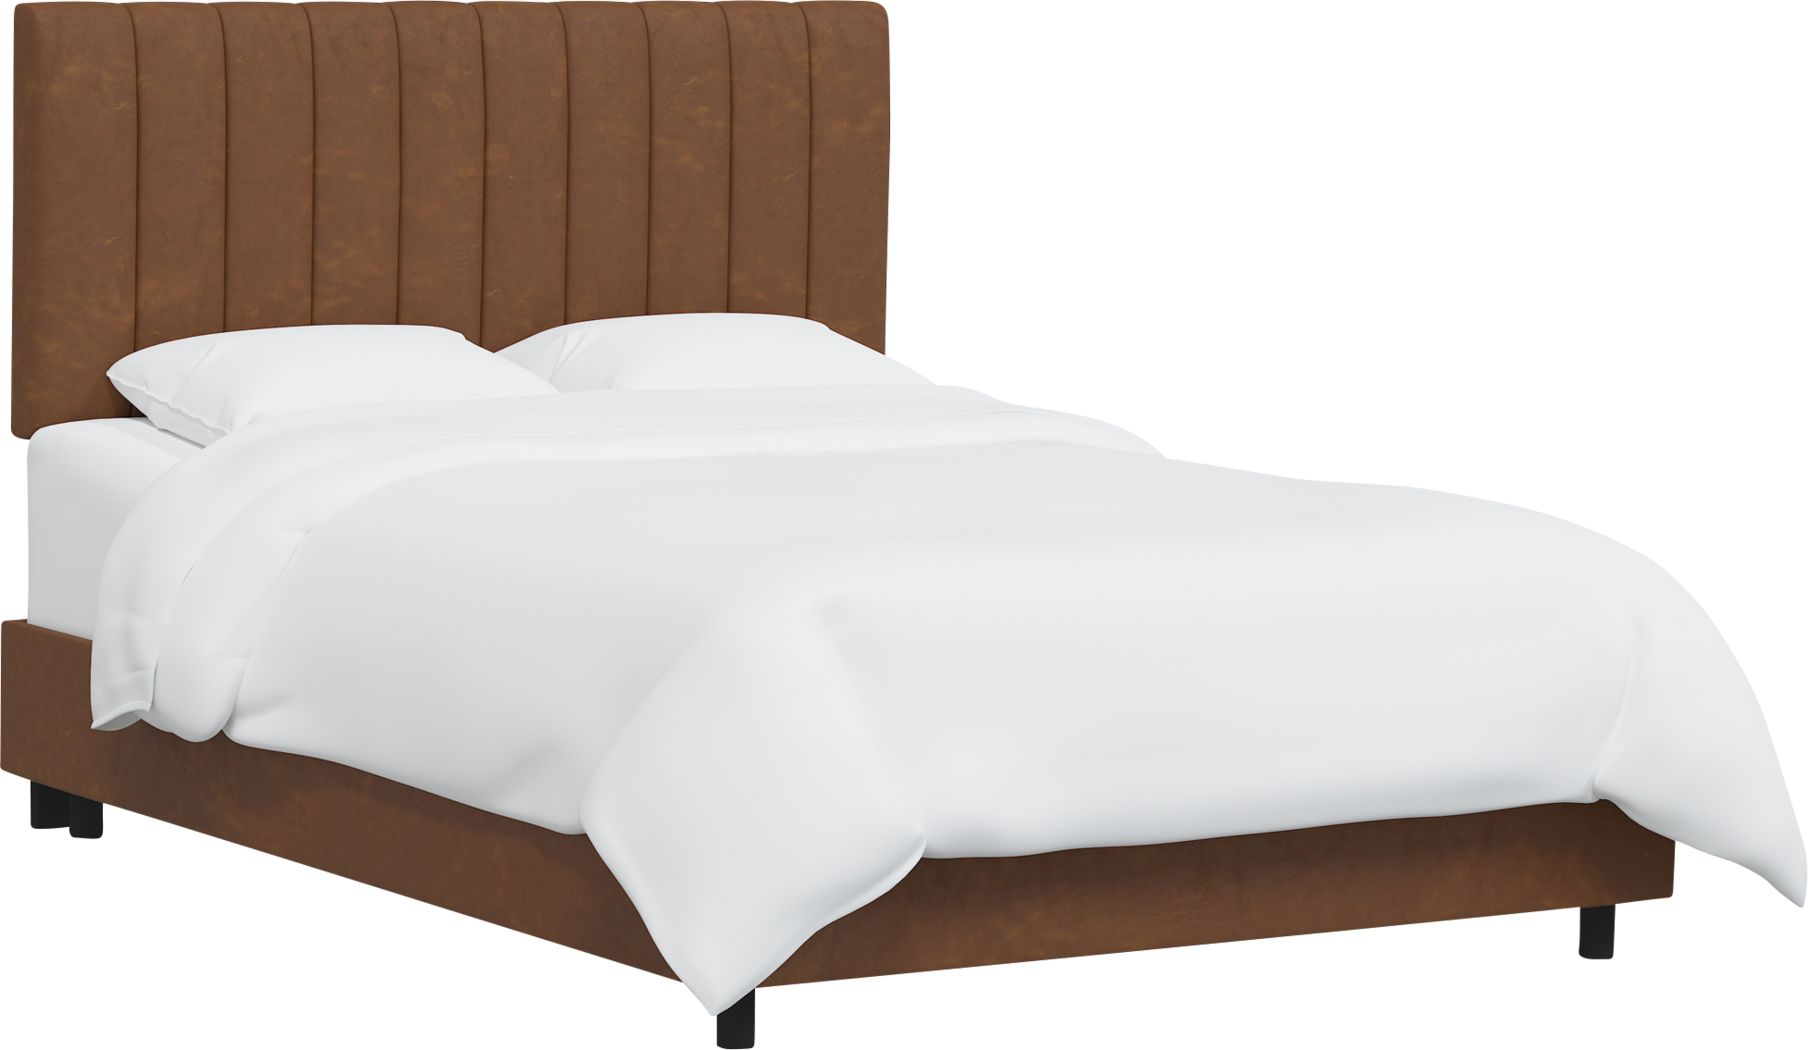 Rustic Saddle I Brown King Upholstered Bed